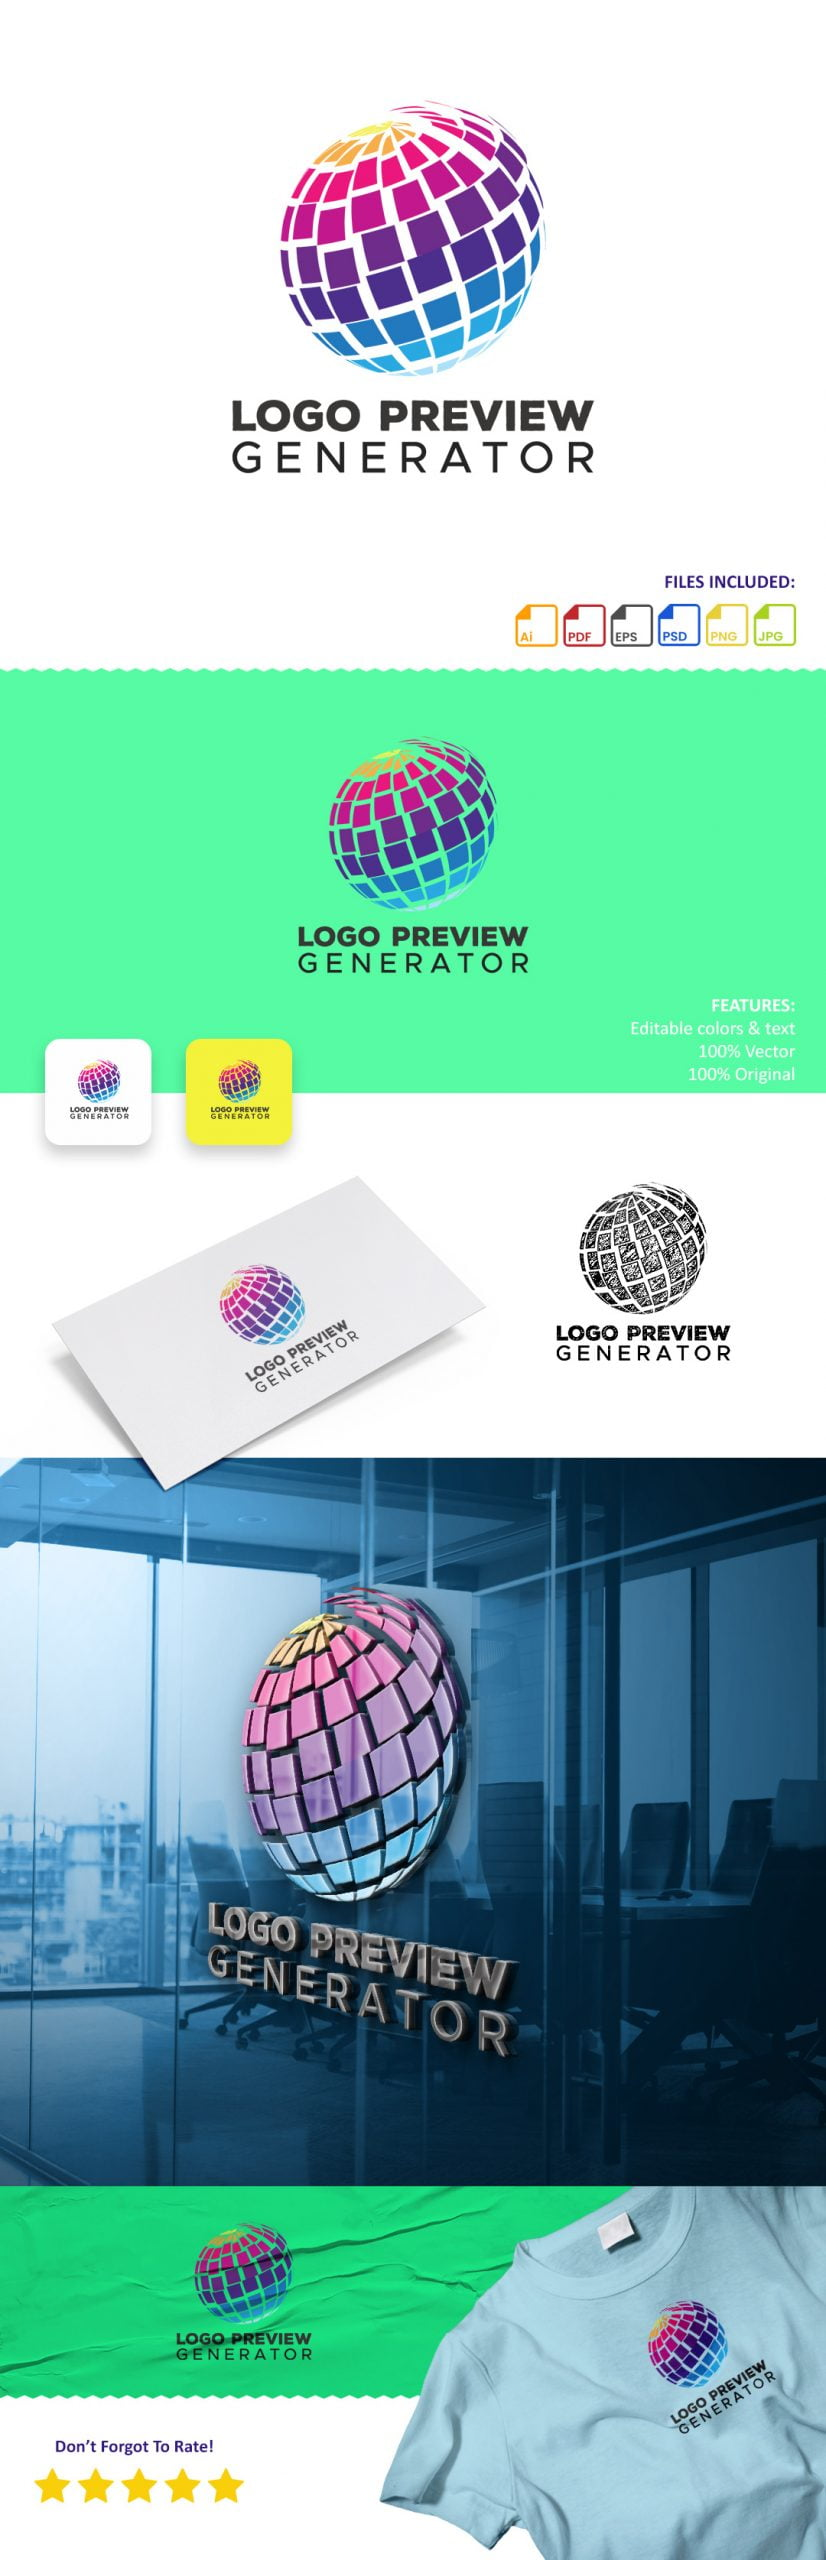 Free Logo Preview Image Generator